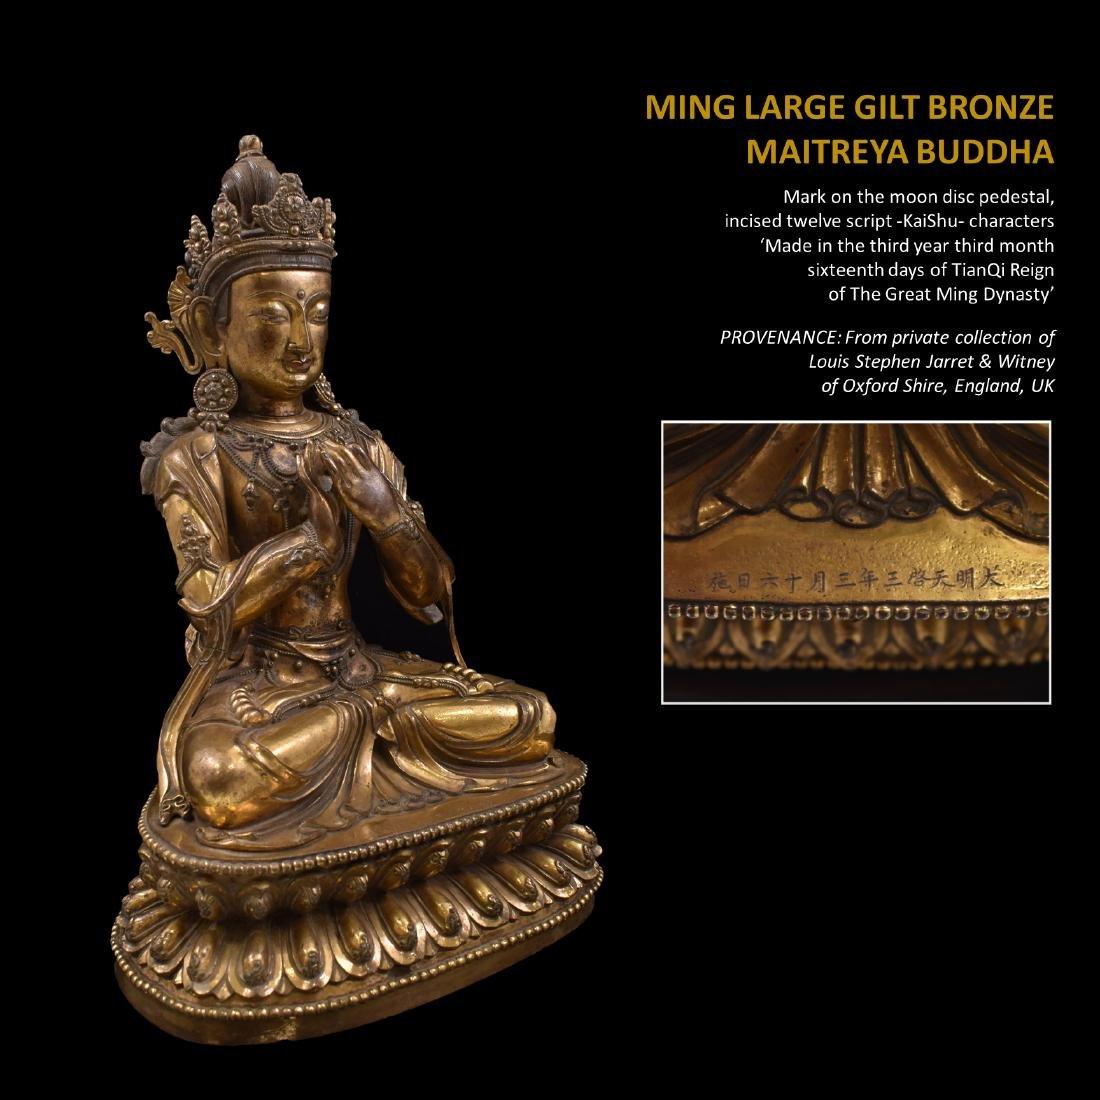 MING LARGE GILT BRONZE MAITREYA BUDDHA